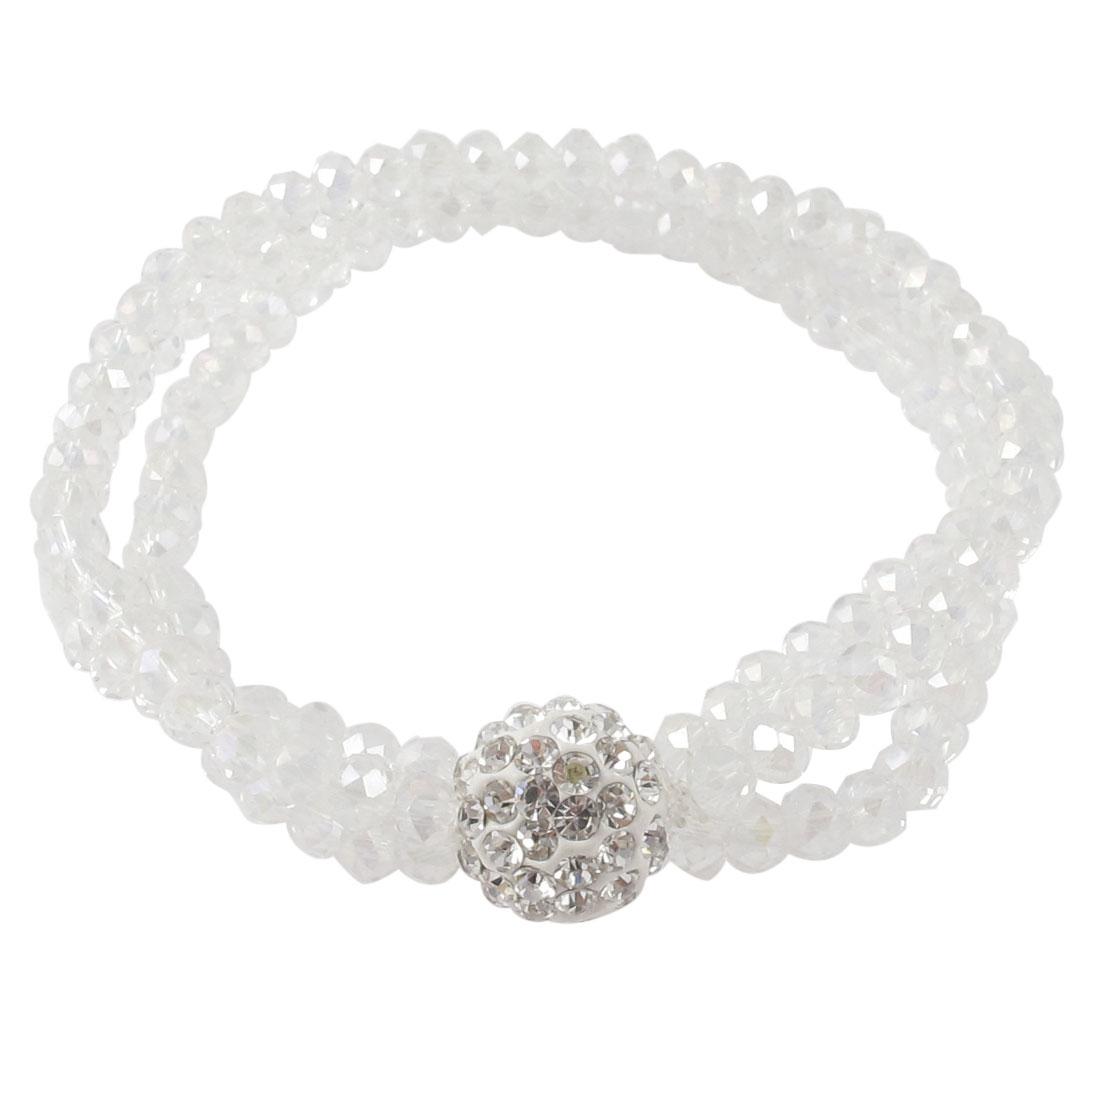 Rhinestones Inlaid Pendant Faceted Bead Decor Elastic Wrist Bracelet Bangle White